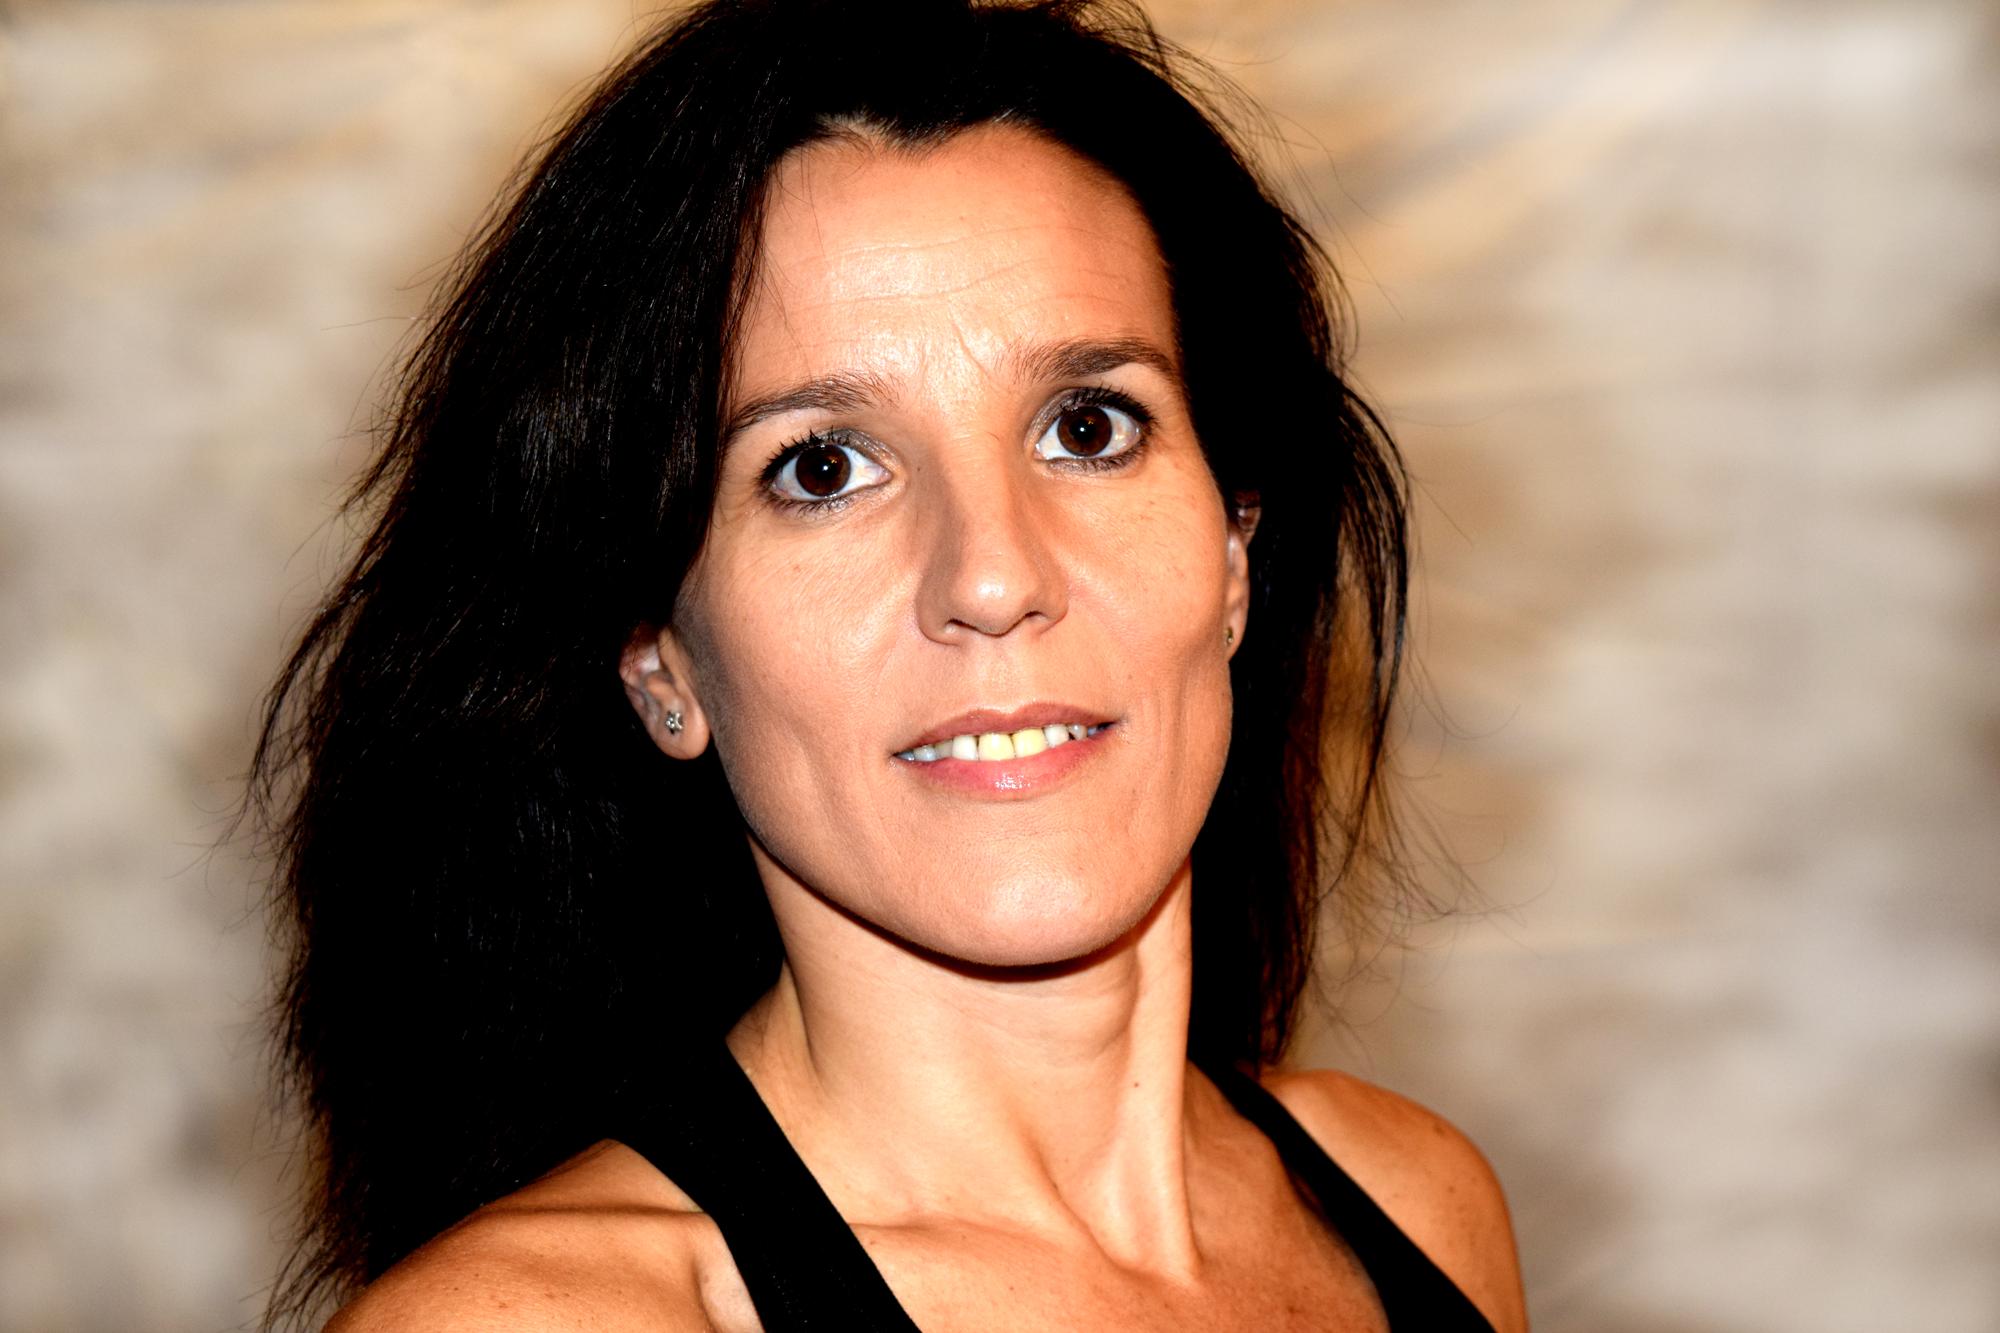 Foto perfil Marta Cabrera 2